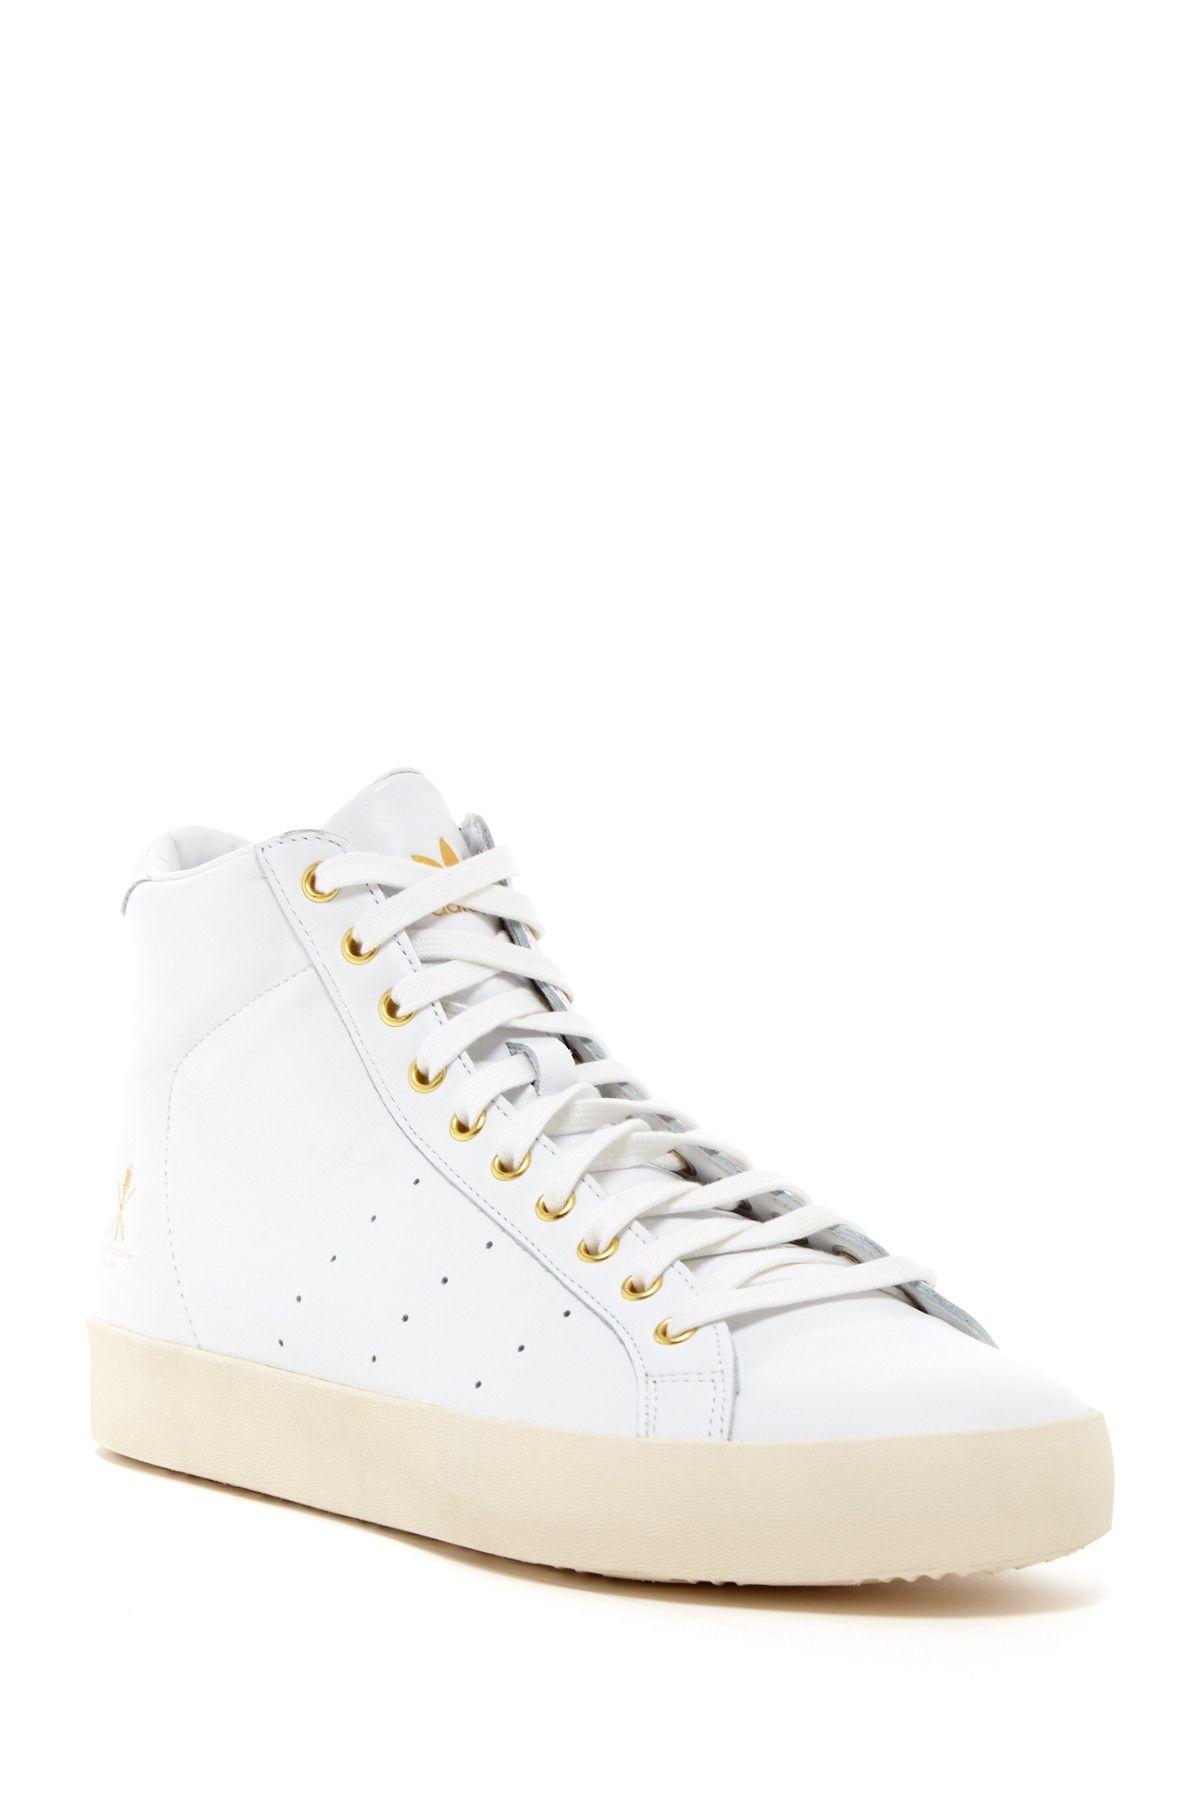 Adidas le alghe vintage - moda / le scarpe da ginnastica pinterest